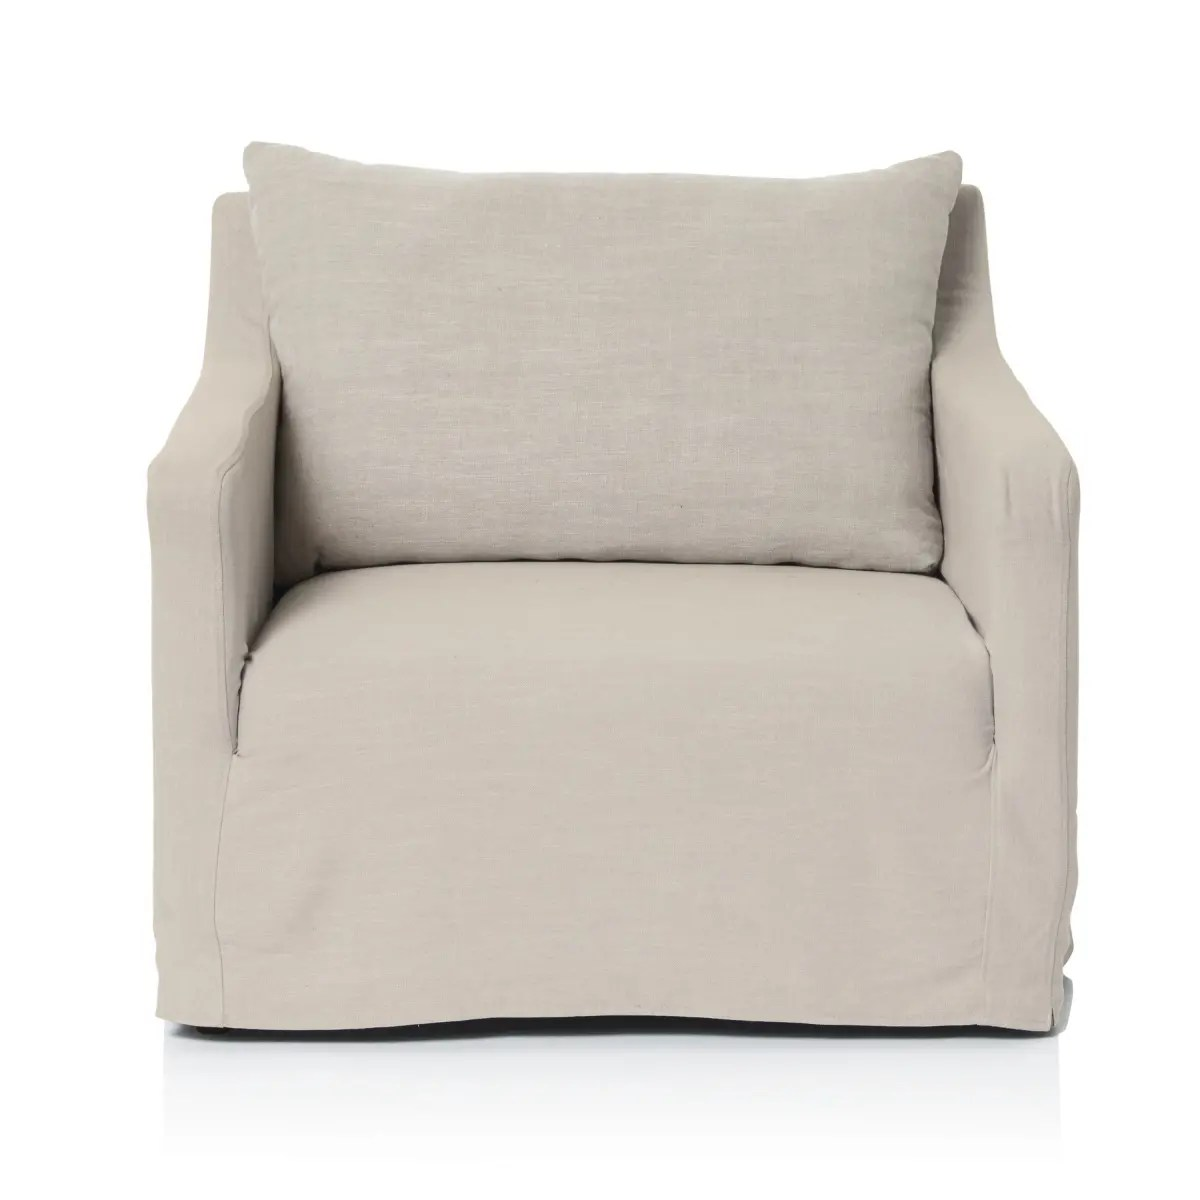 Sessel Husse Sessel überwurf Ohrensessel Bestseller Shop Für Möbel